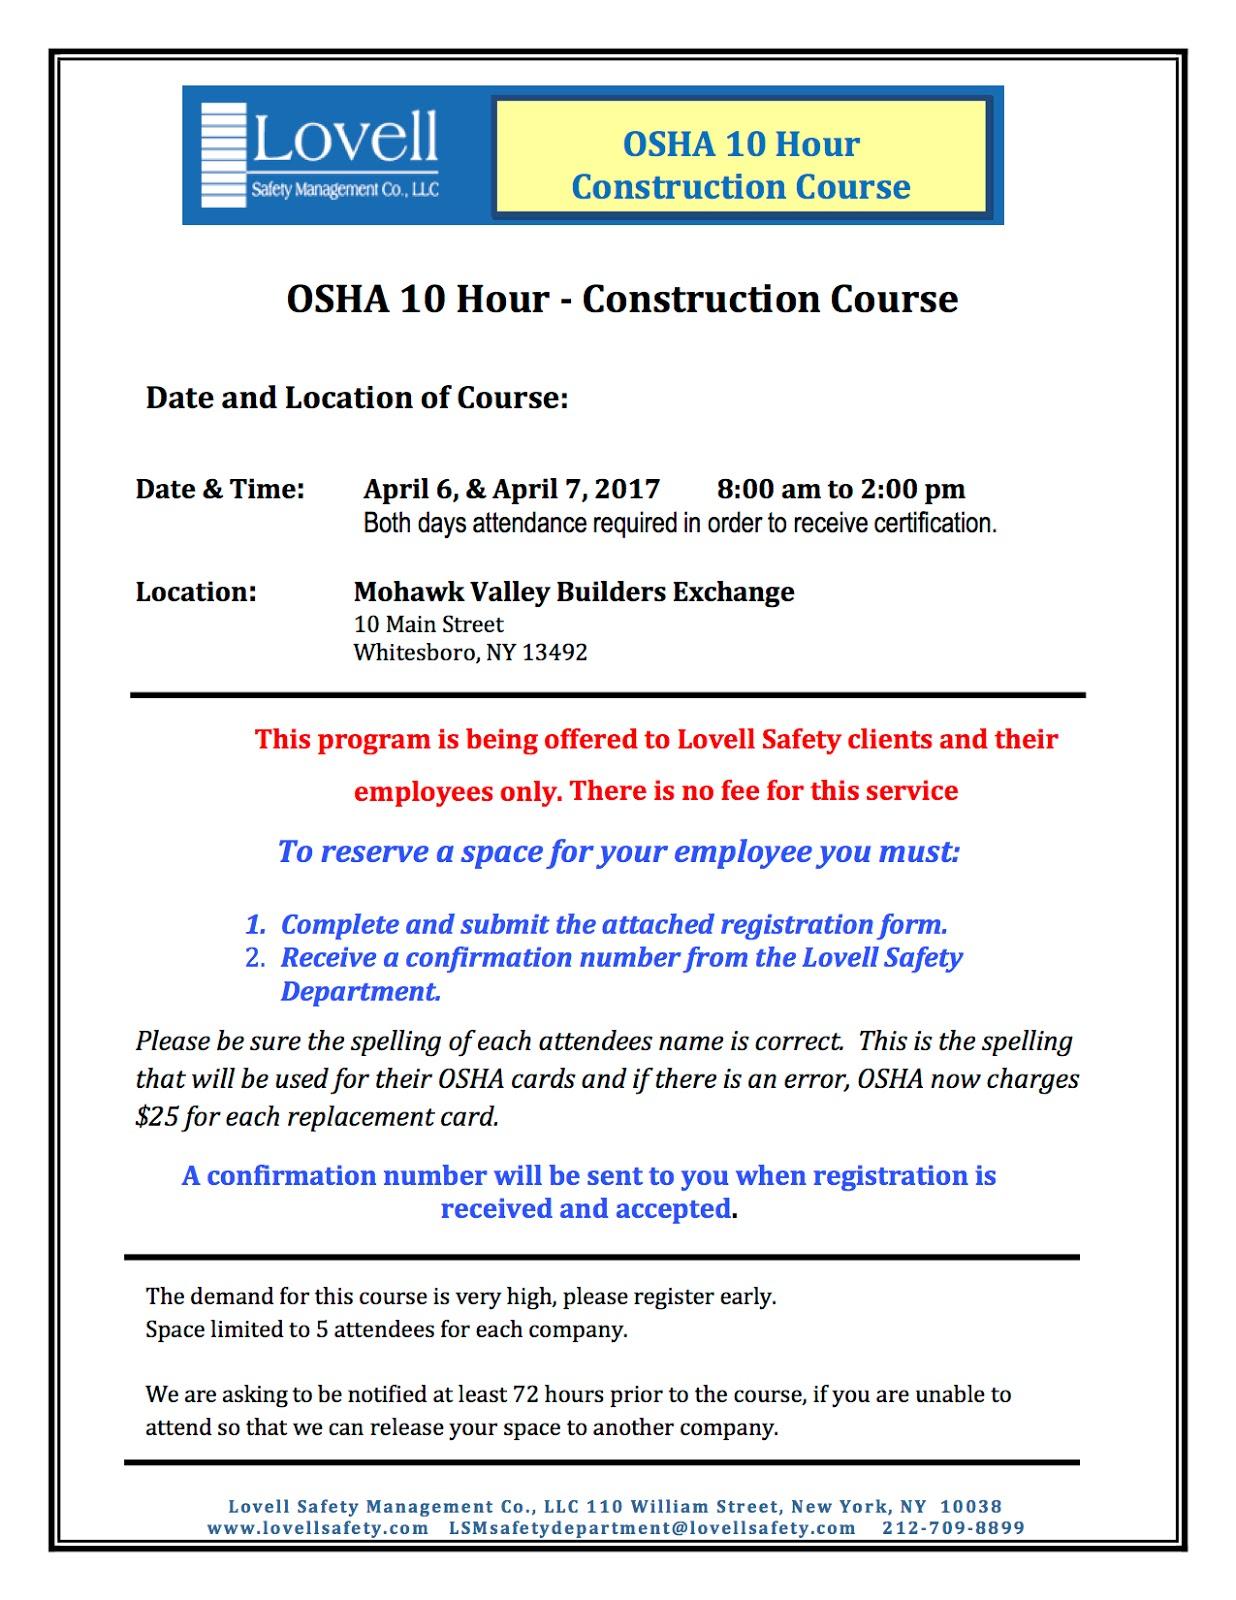 Safety Pays Osha 10 Hour Course April 6 April 7 In Whitesboro Ny